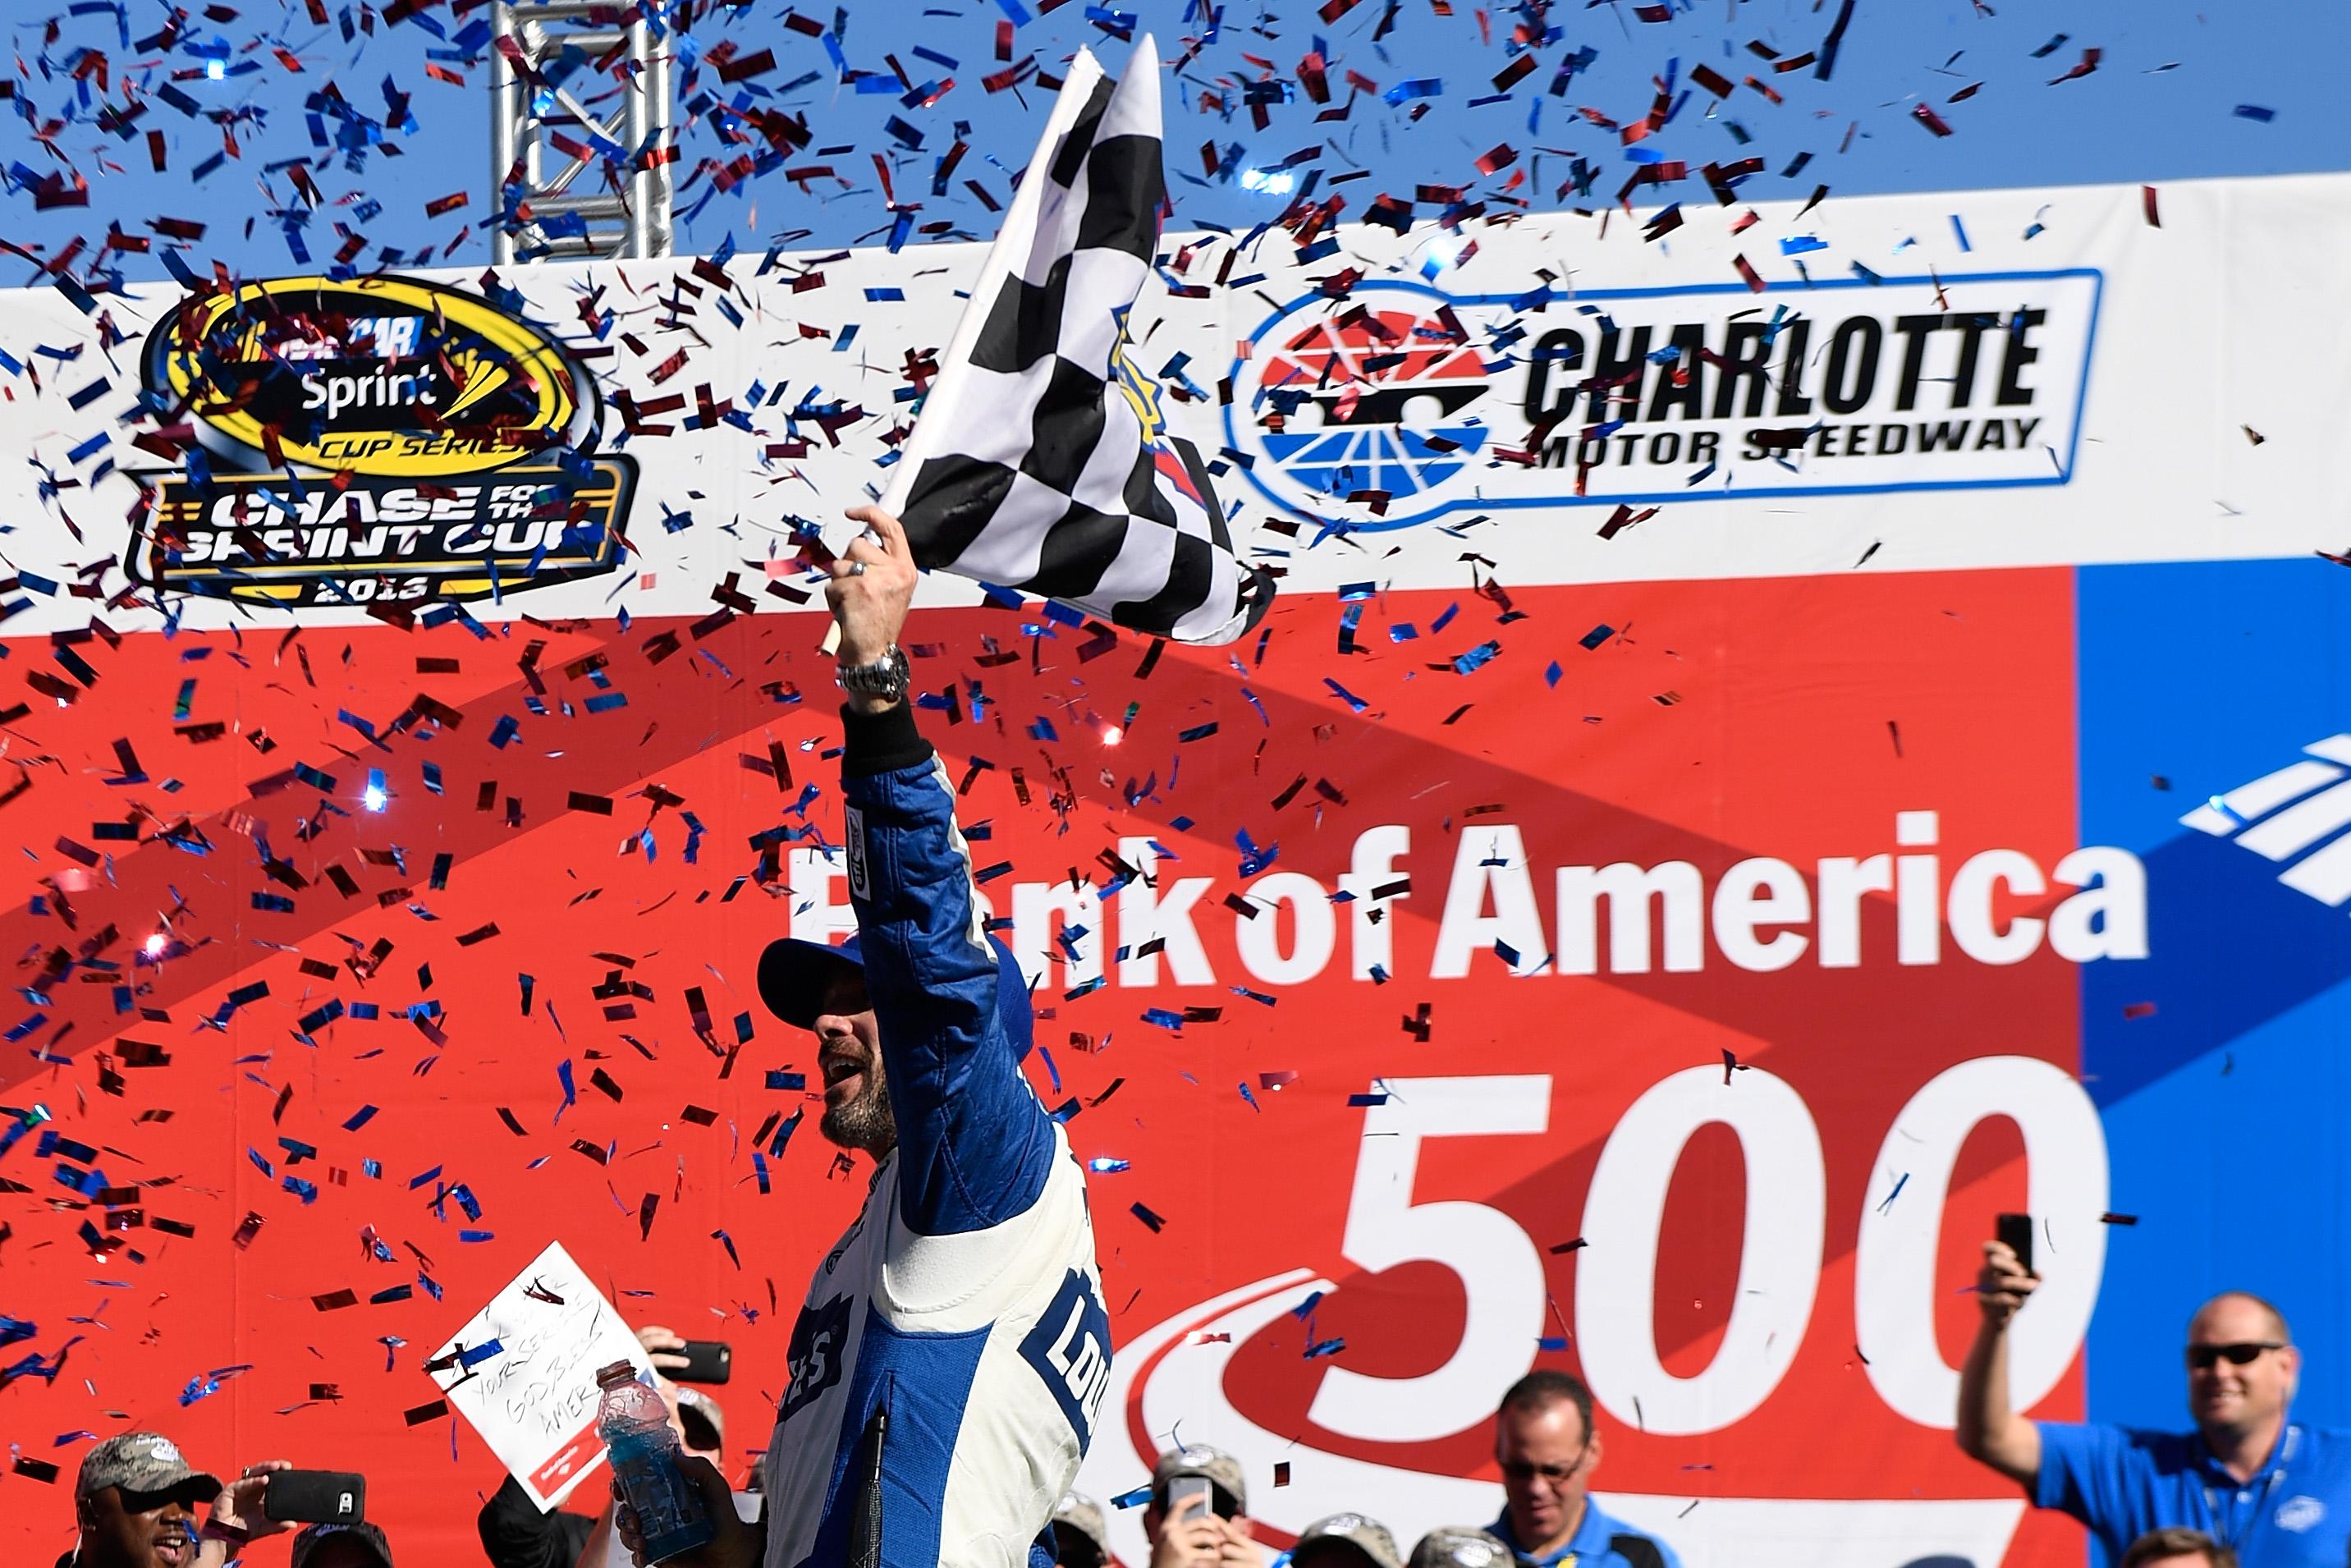 NASCAR Sprint Cup Series Bank of America 500